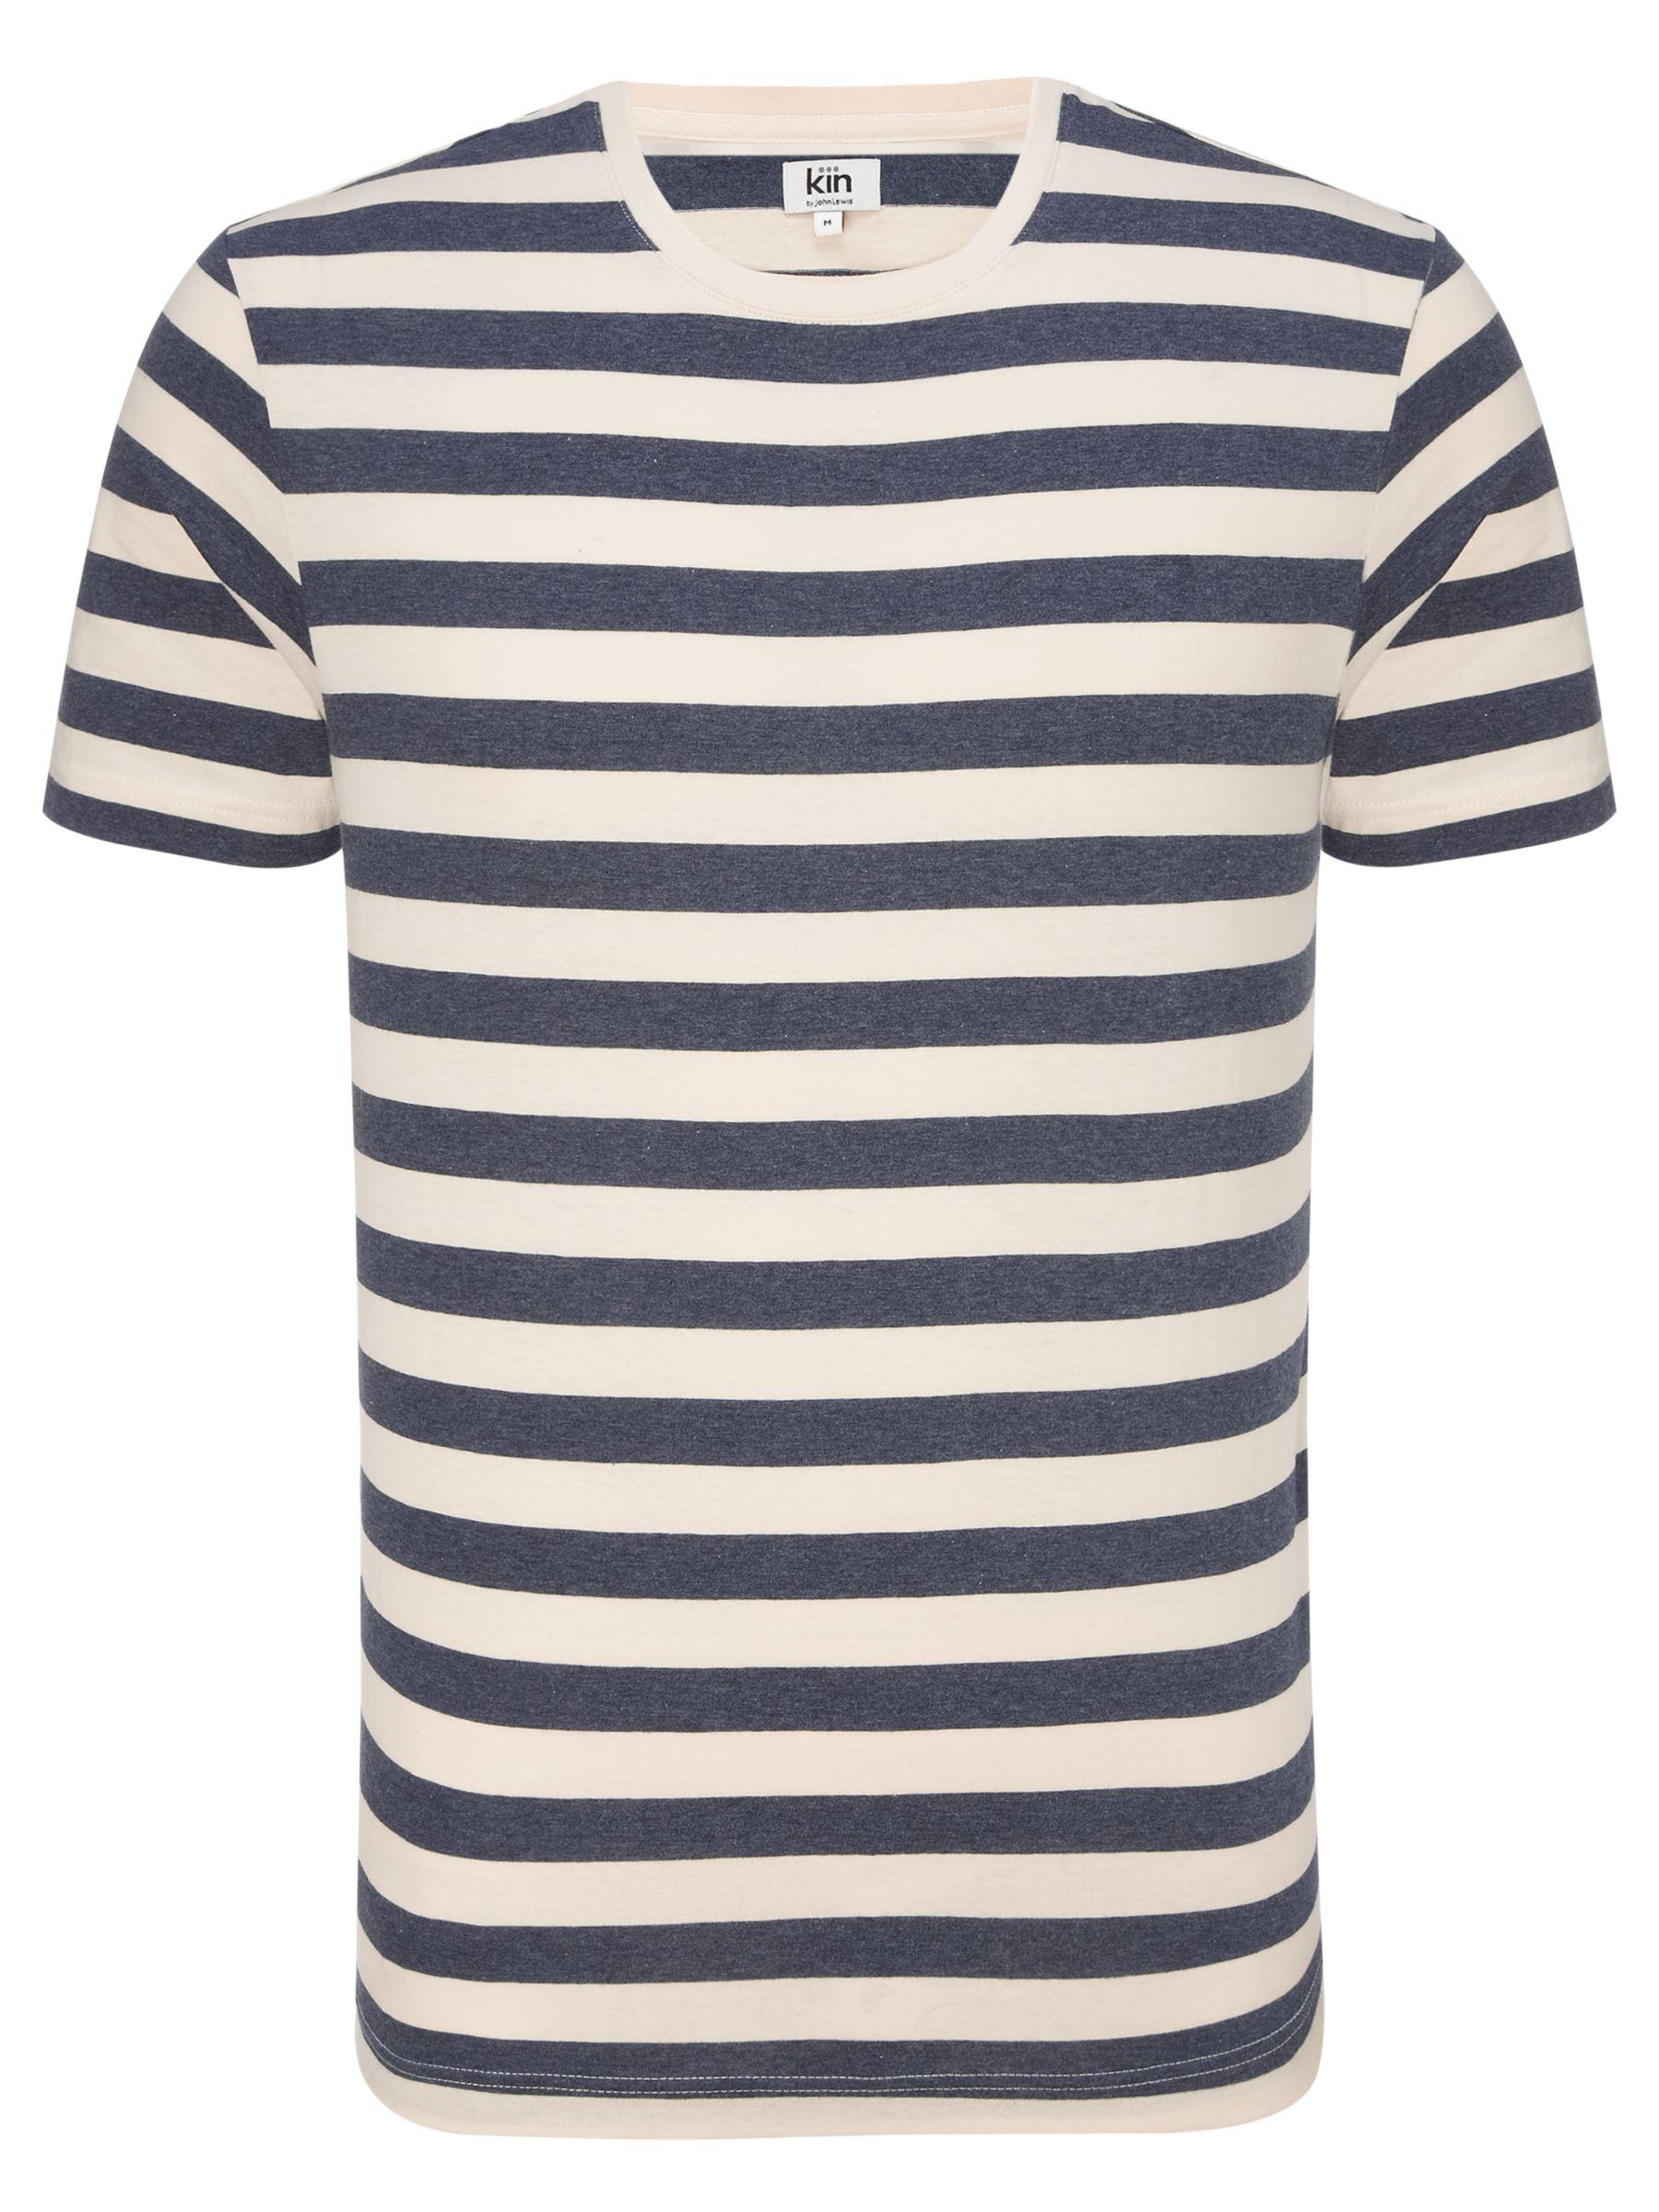 Kin by John Lewis Stripe Crew Neck T-Shirt, Navy/Cream